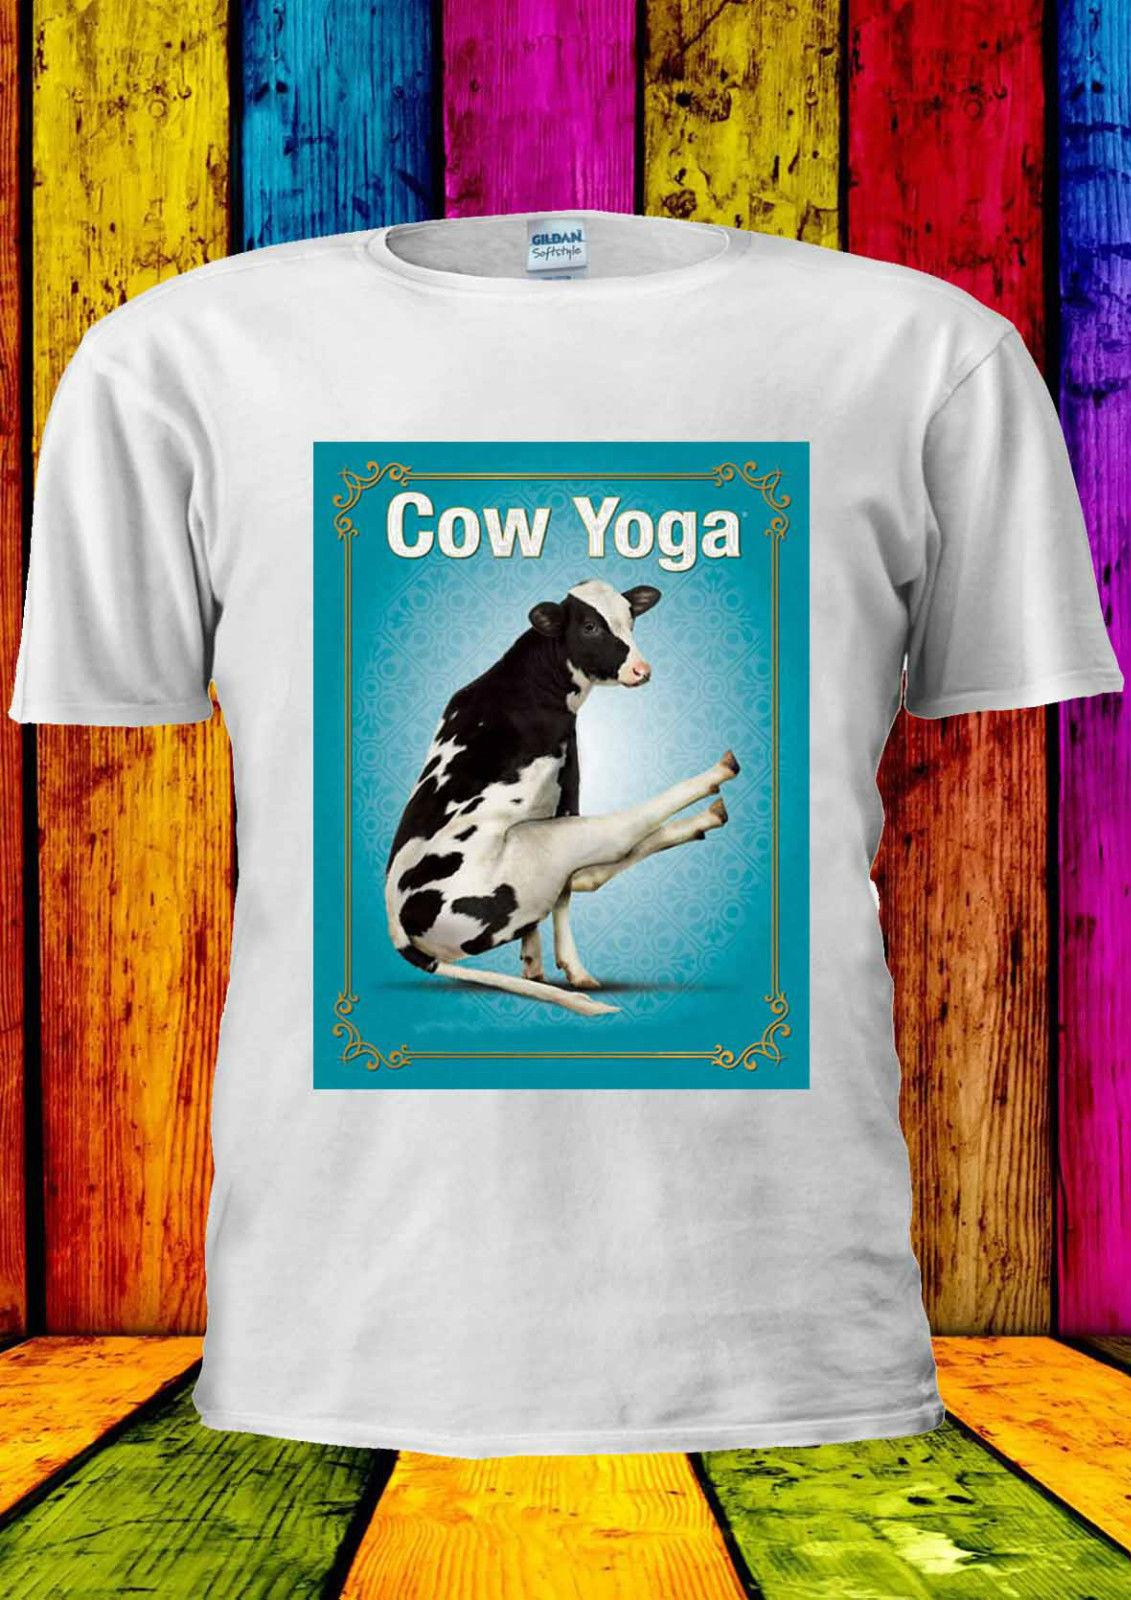 Cow Yoga Tumblr Funny Urban Fashion T Shirt Vest Tank Top Men Women Unisex 1811 Mens Pride Dark T Shirt Cool Tee Shirts Cool Tees From Qz1538381382 16 24 Dhgate Com